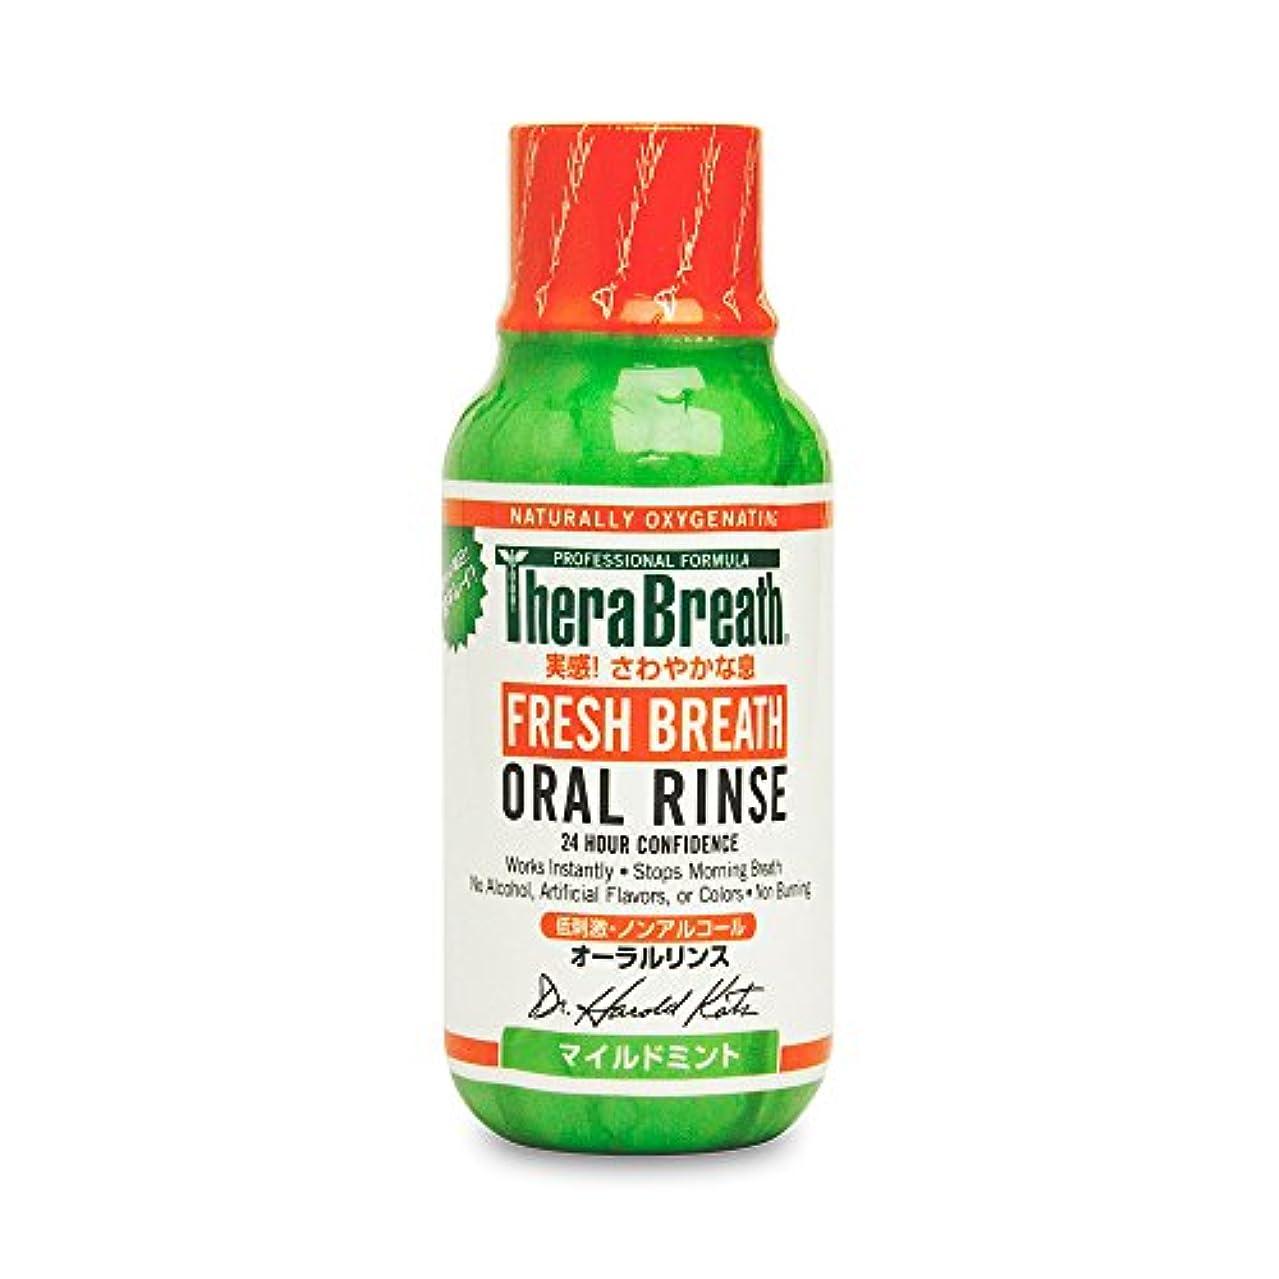 TheraBreath (セラブレス) セラブレス オーラルリンスミニボトル 88ml (正規輸入品) マウスウォッシュ